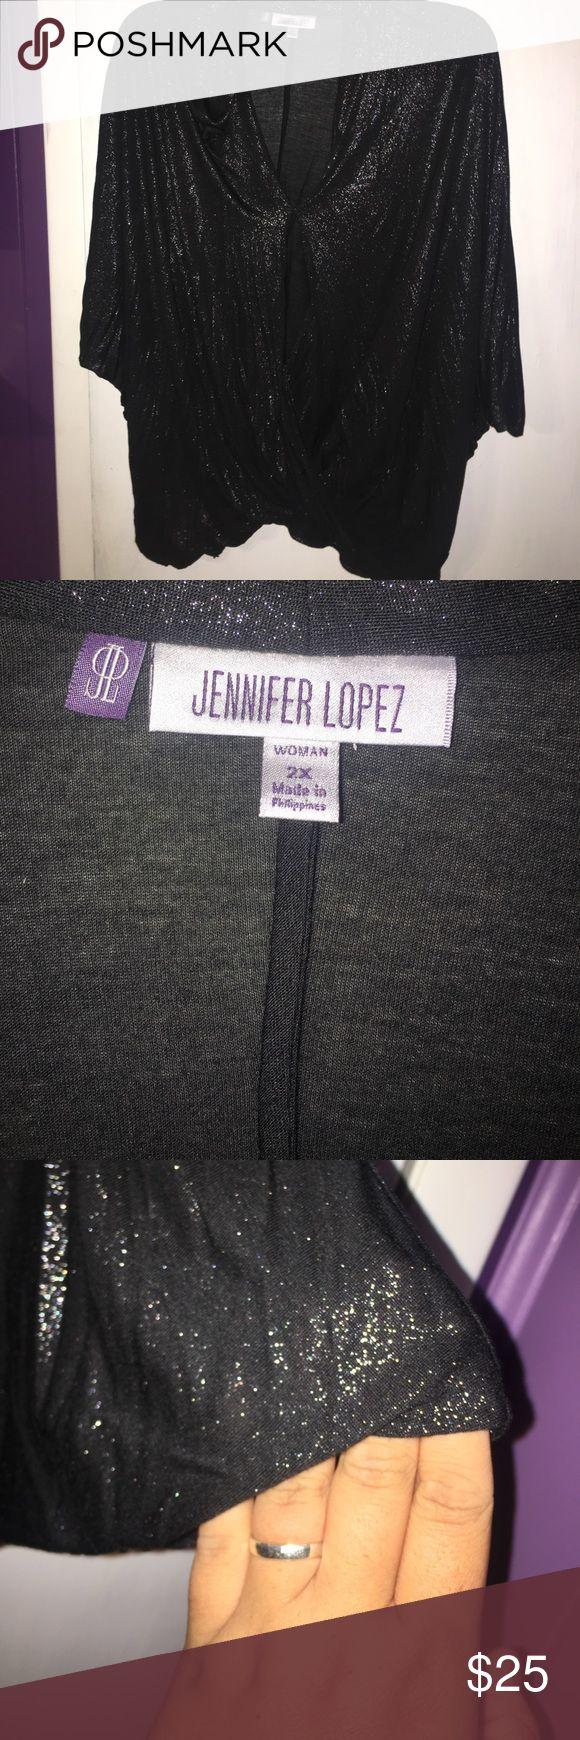 Black sparkly 2X Jen Lopez shirt NWT Perfect condition NWT Sparkly black shirt Jennifer Lopez Tops Blouses